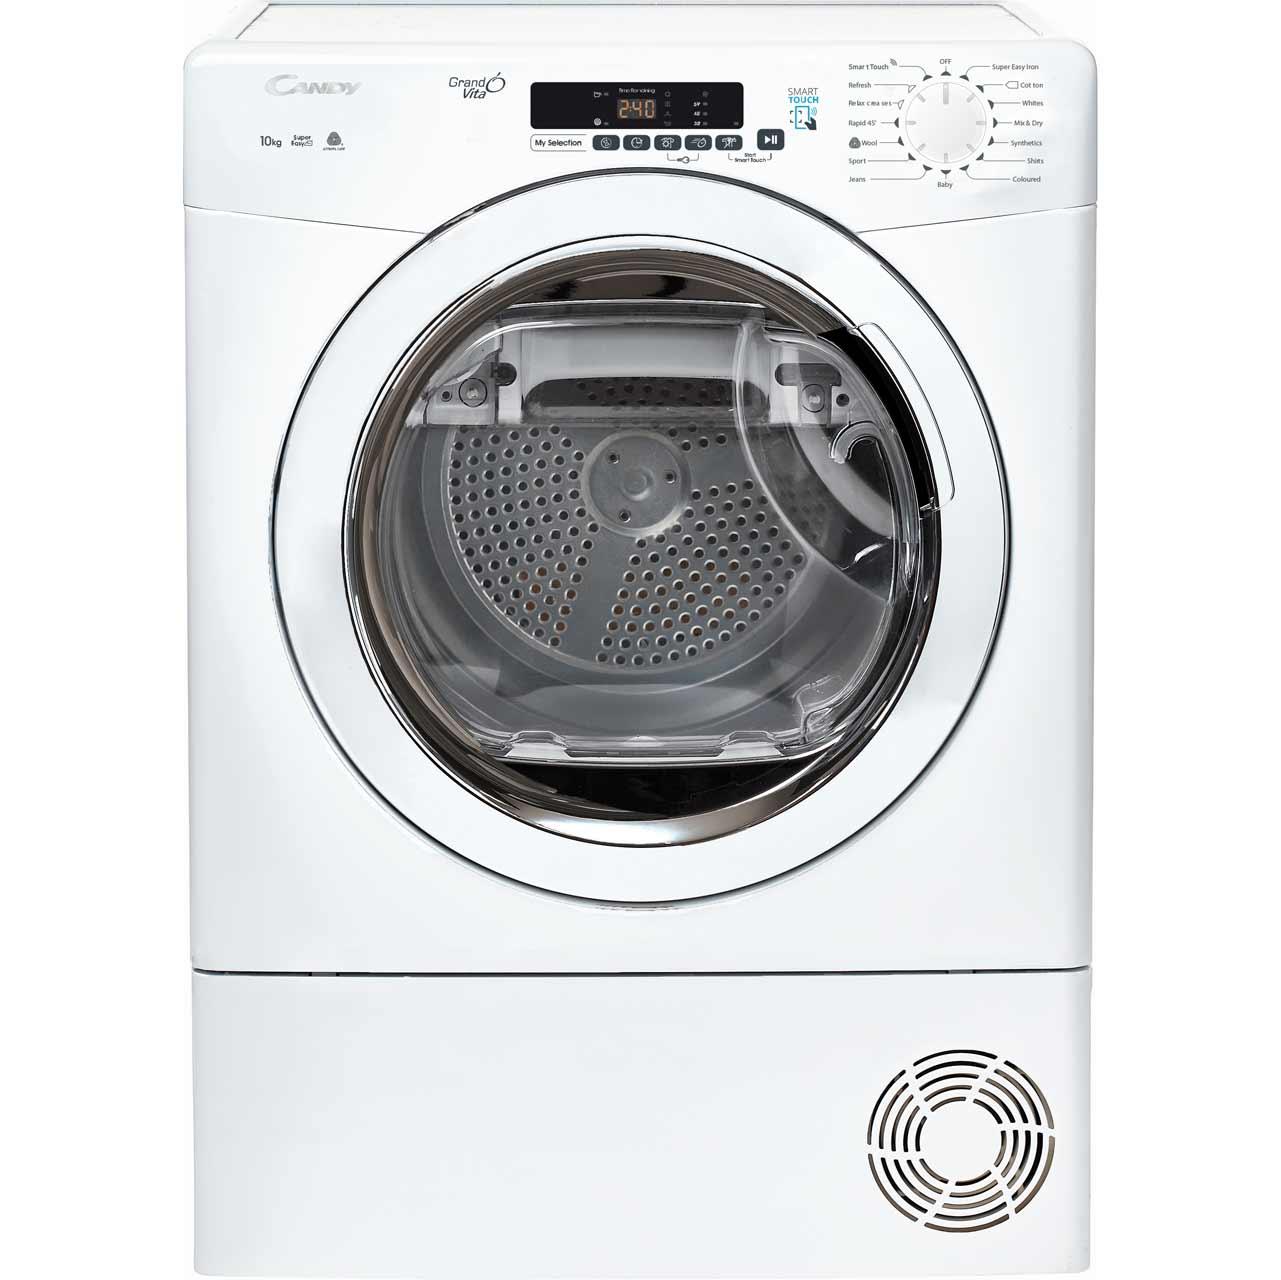 Candy Grand O Vita Gvsc10de Tumble Dryer Appliance Spotter